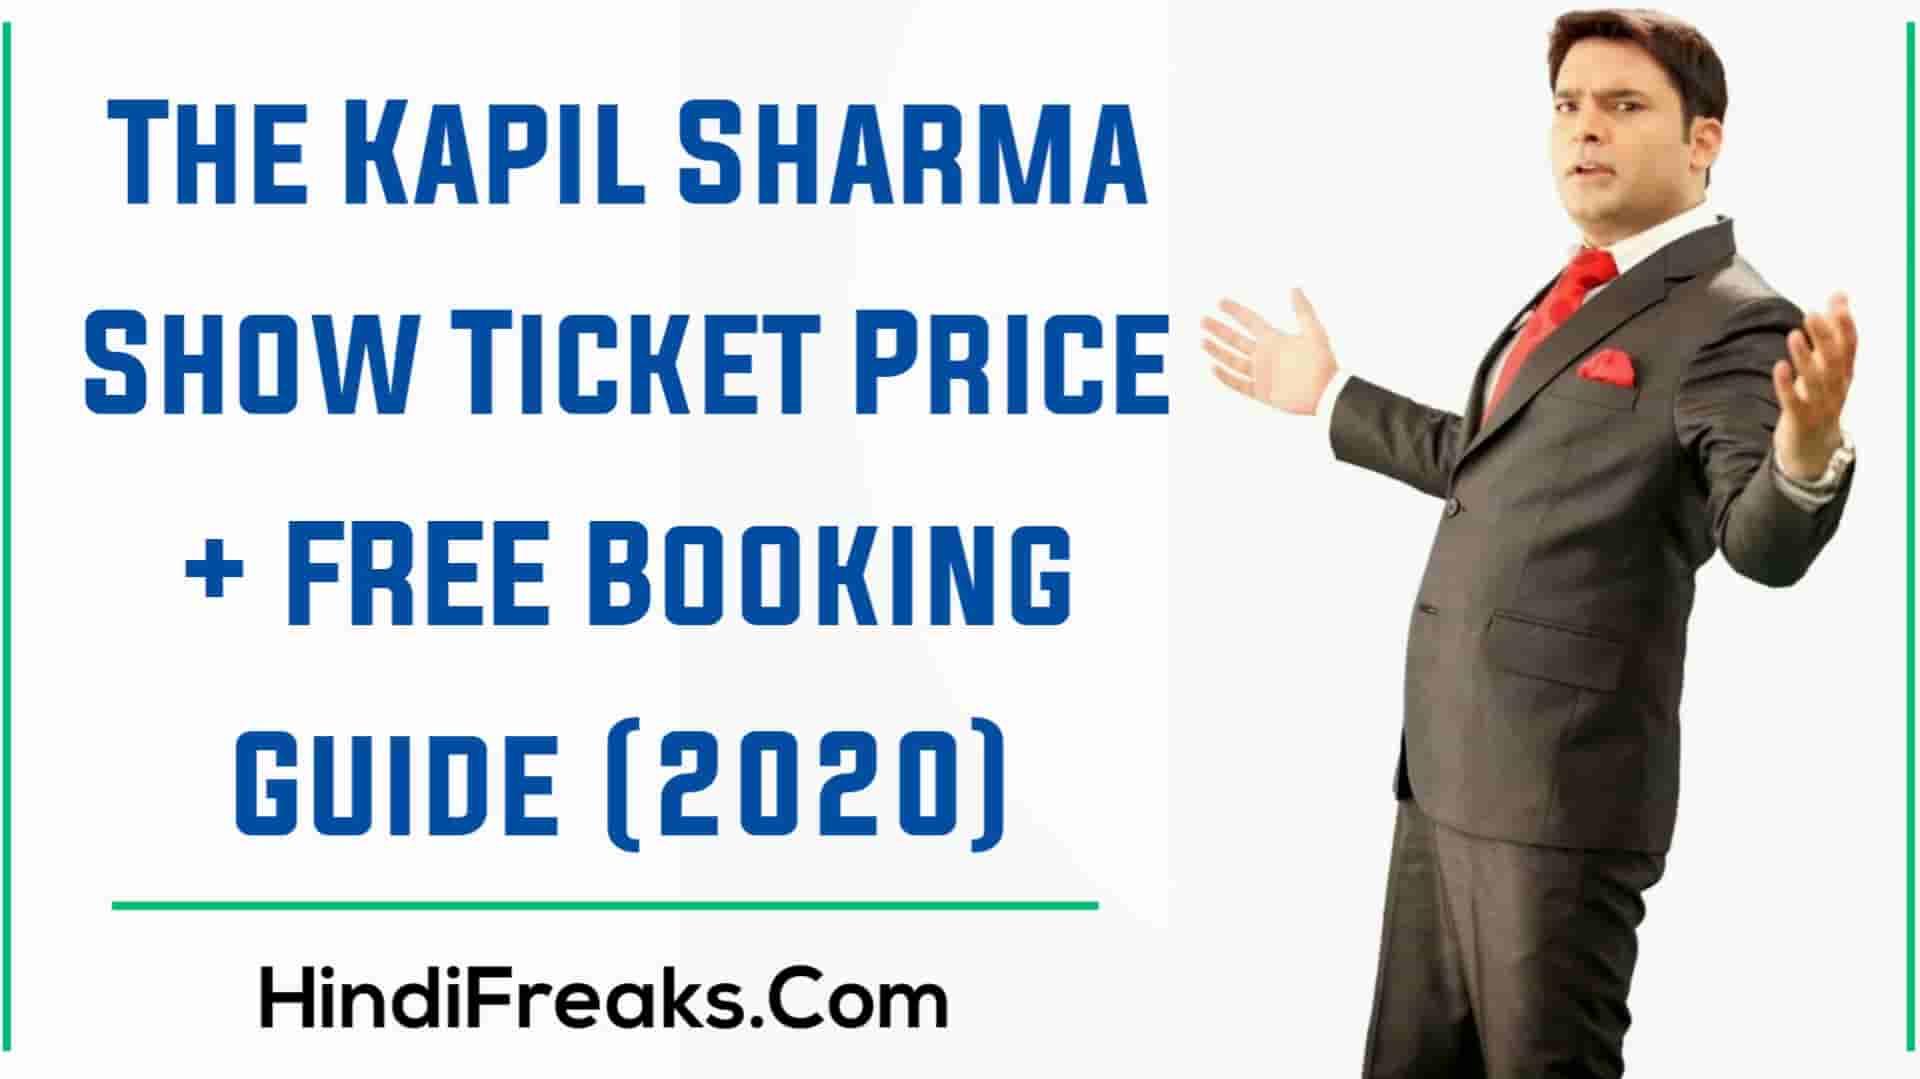 The Kapil Sharma Show Ticket Price